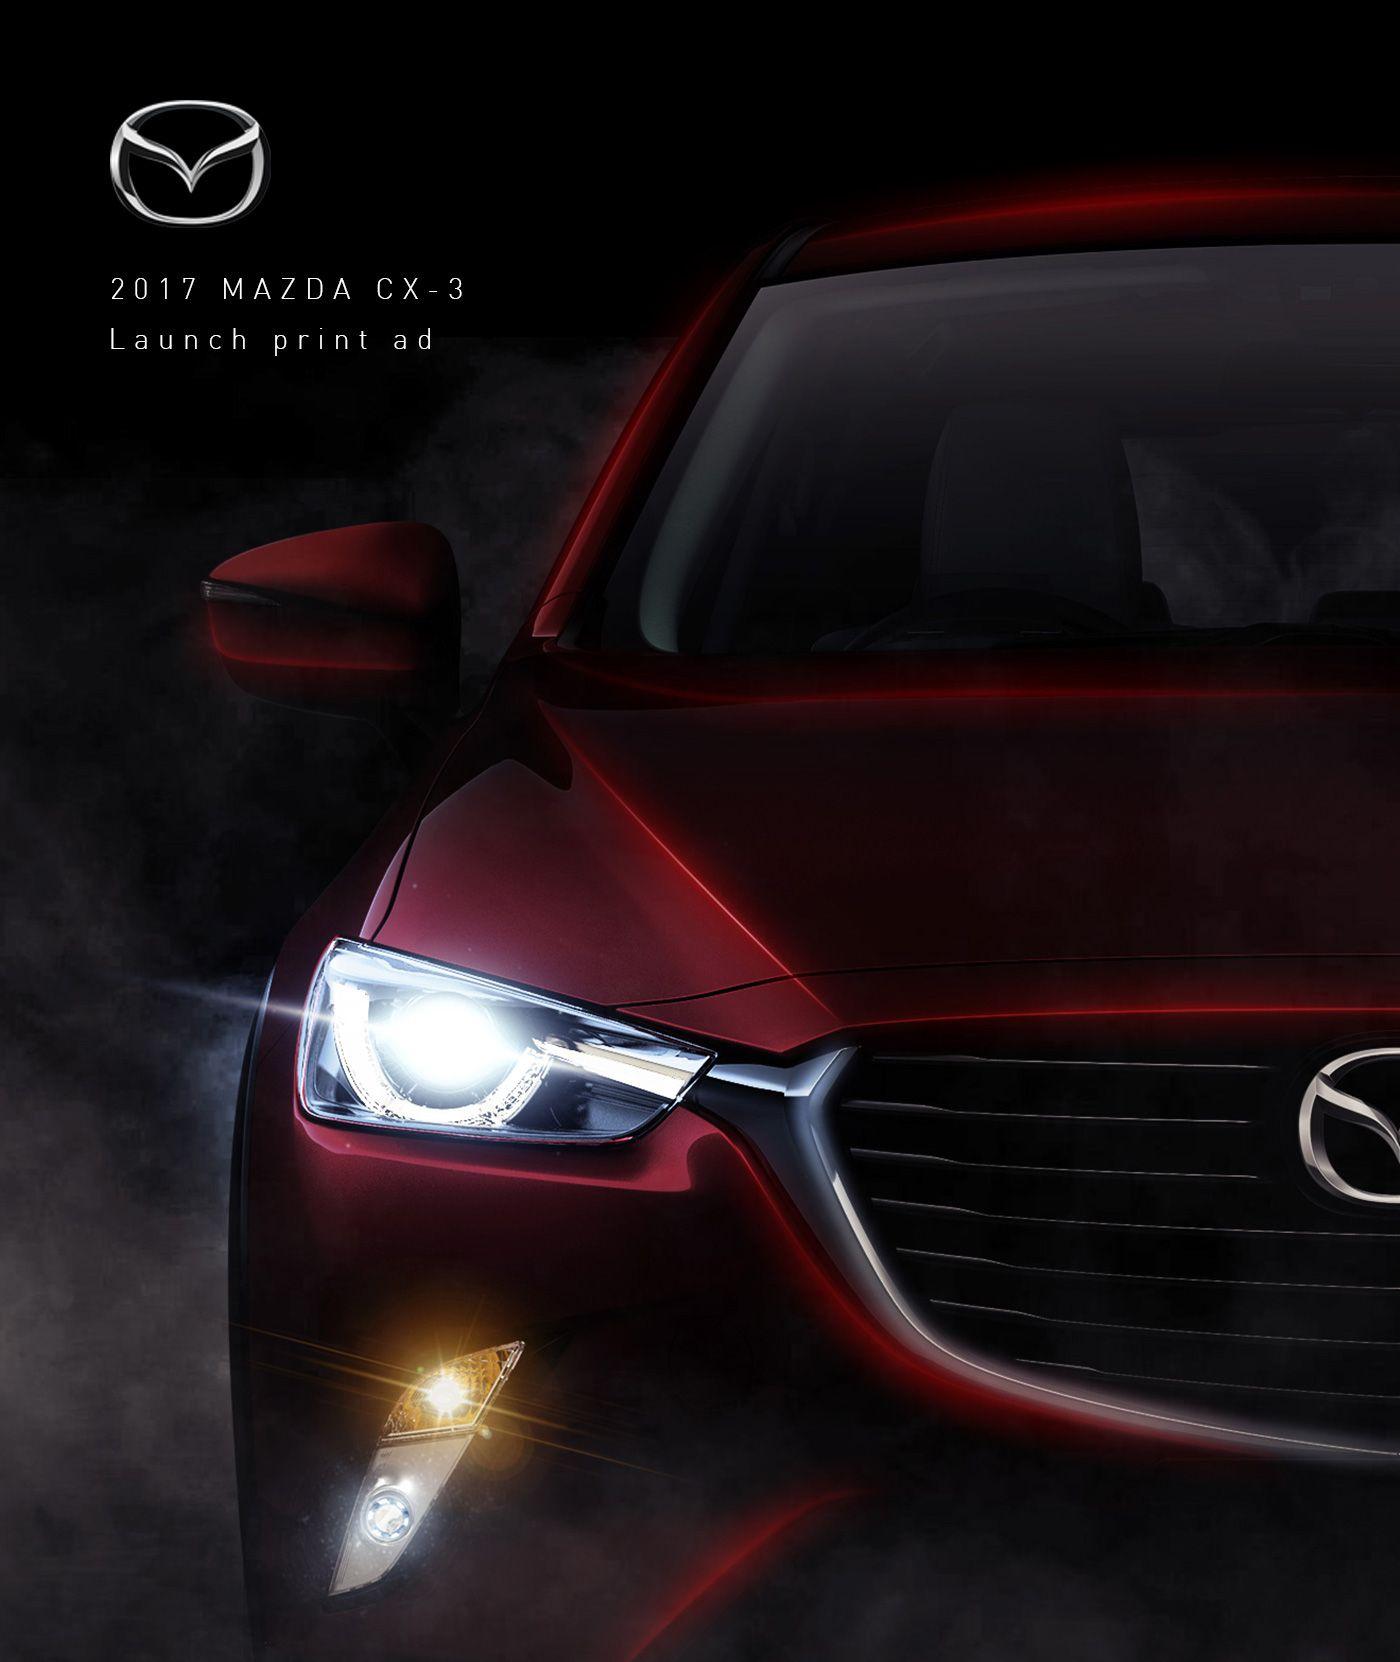 2017 Mazda CX3 Launch Print ads on Behance 汽车, 自動車, 広告